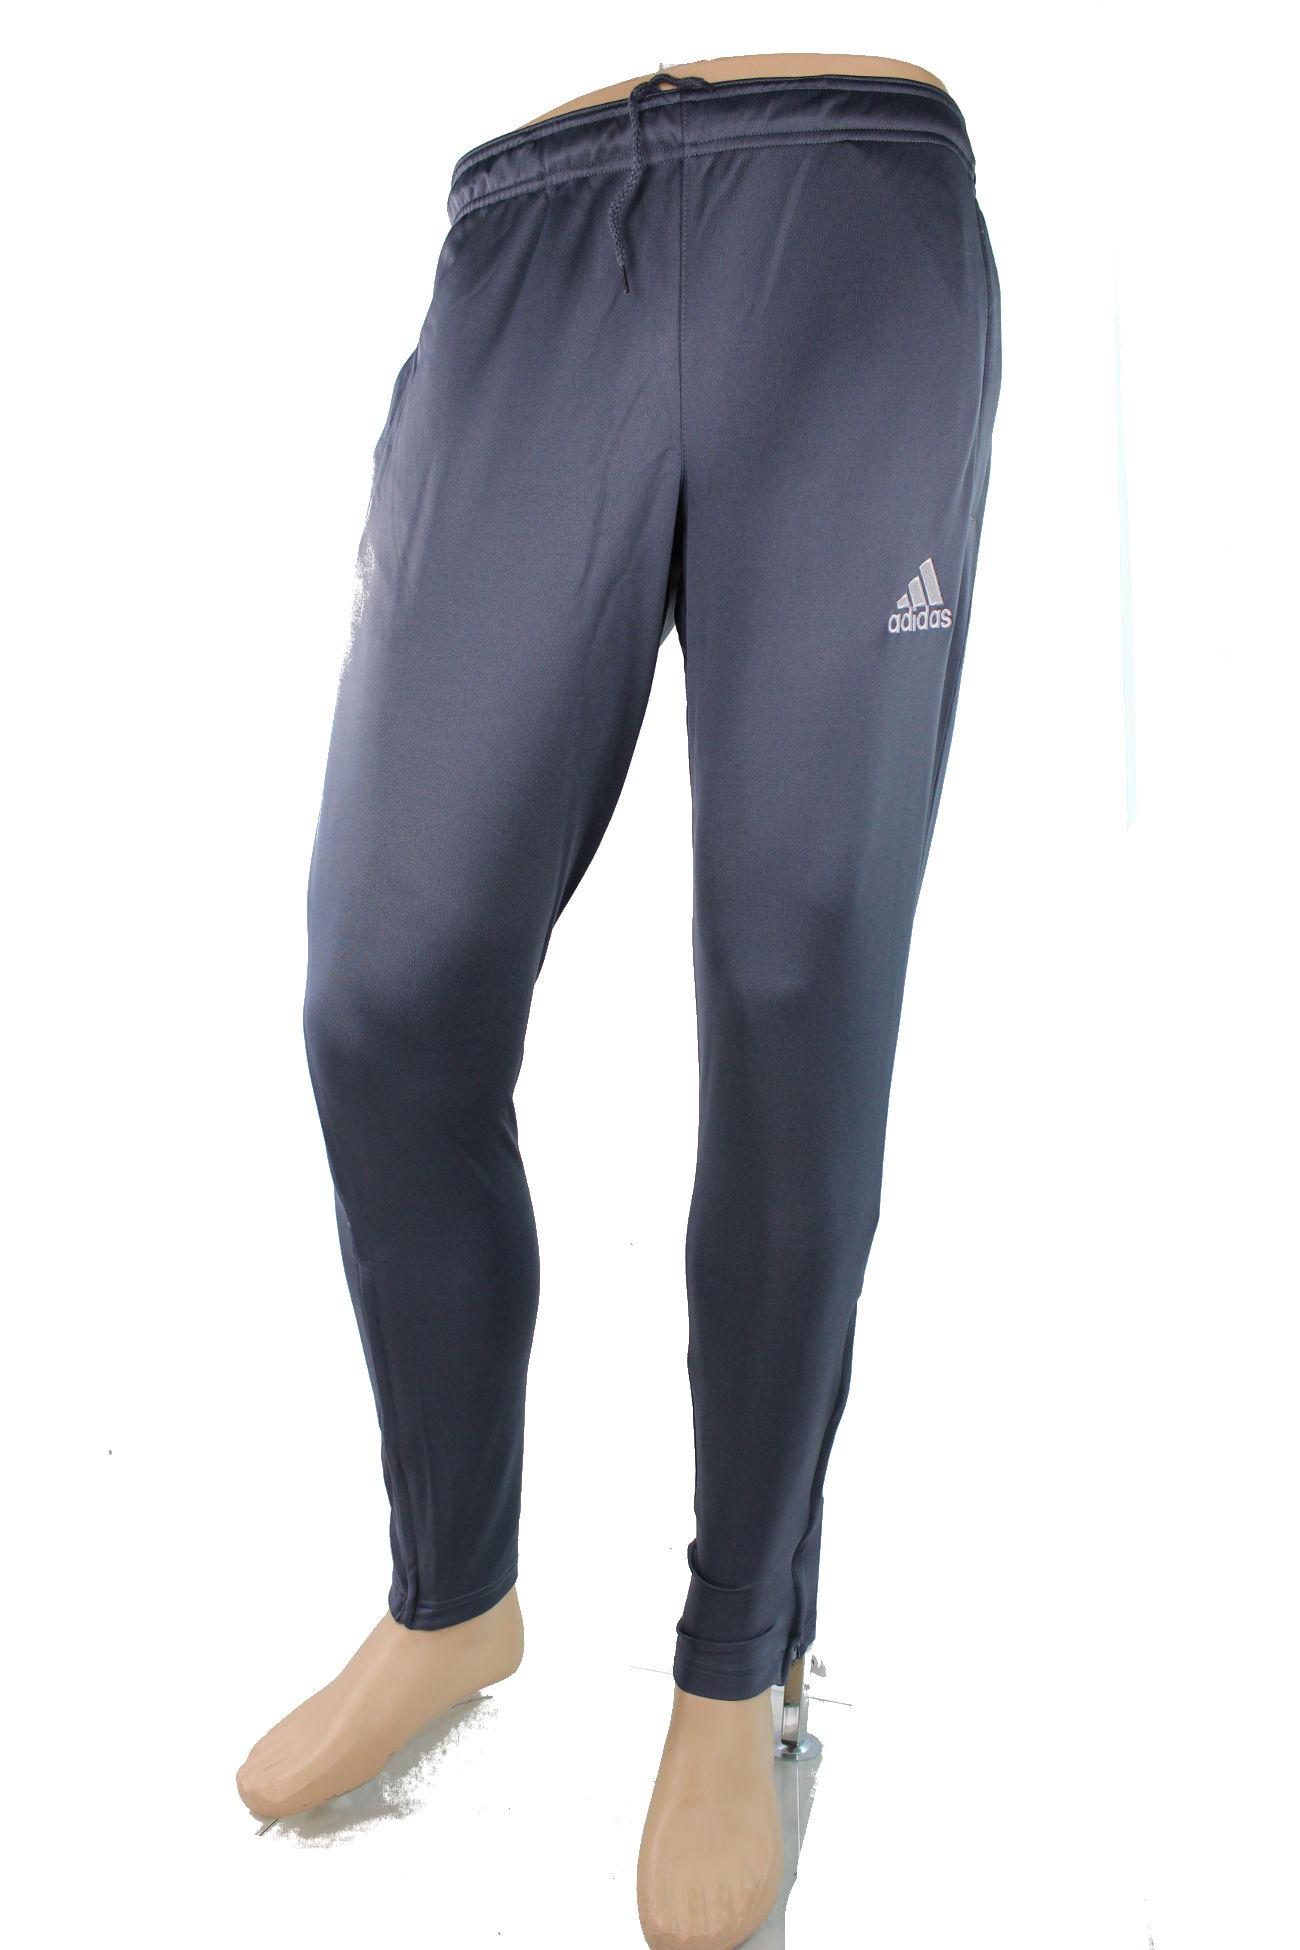 core 15 adidas track pantalon pants hose cheville proximit training homme ebay. Black Bedroom Furniture Sets. Home Design Ideas